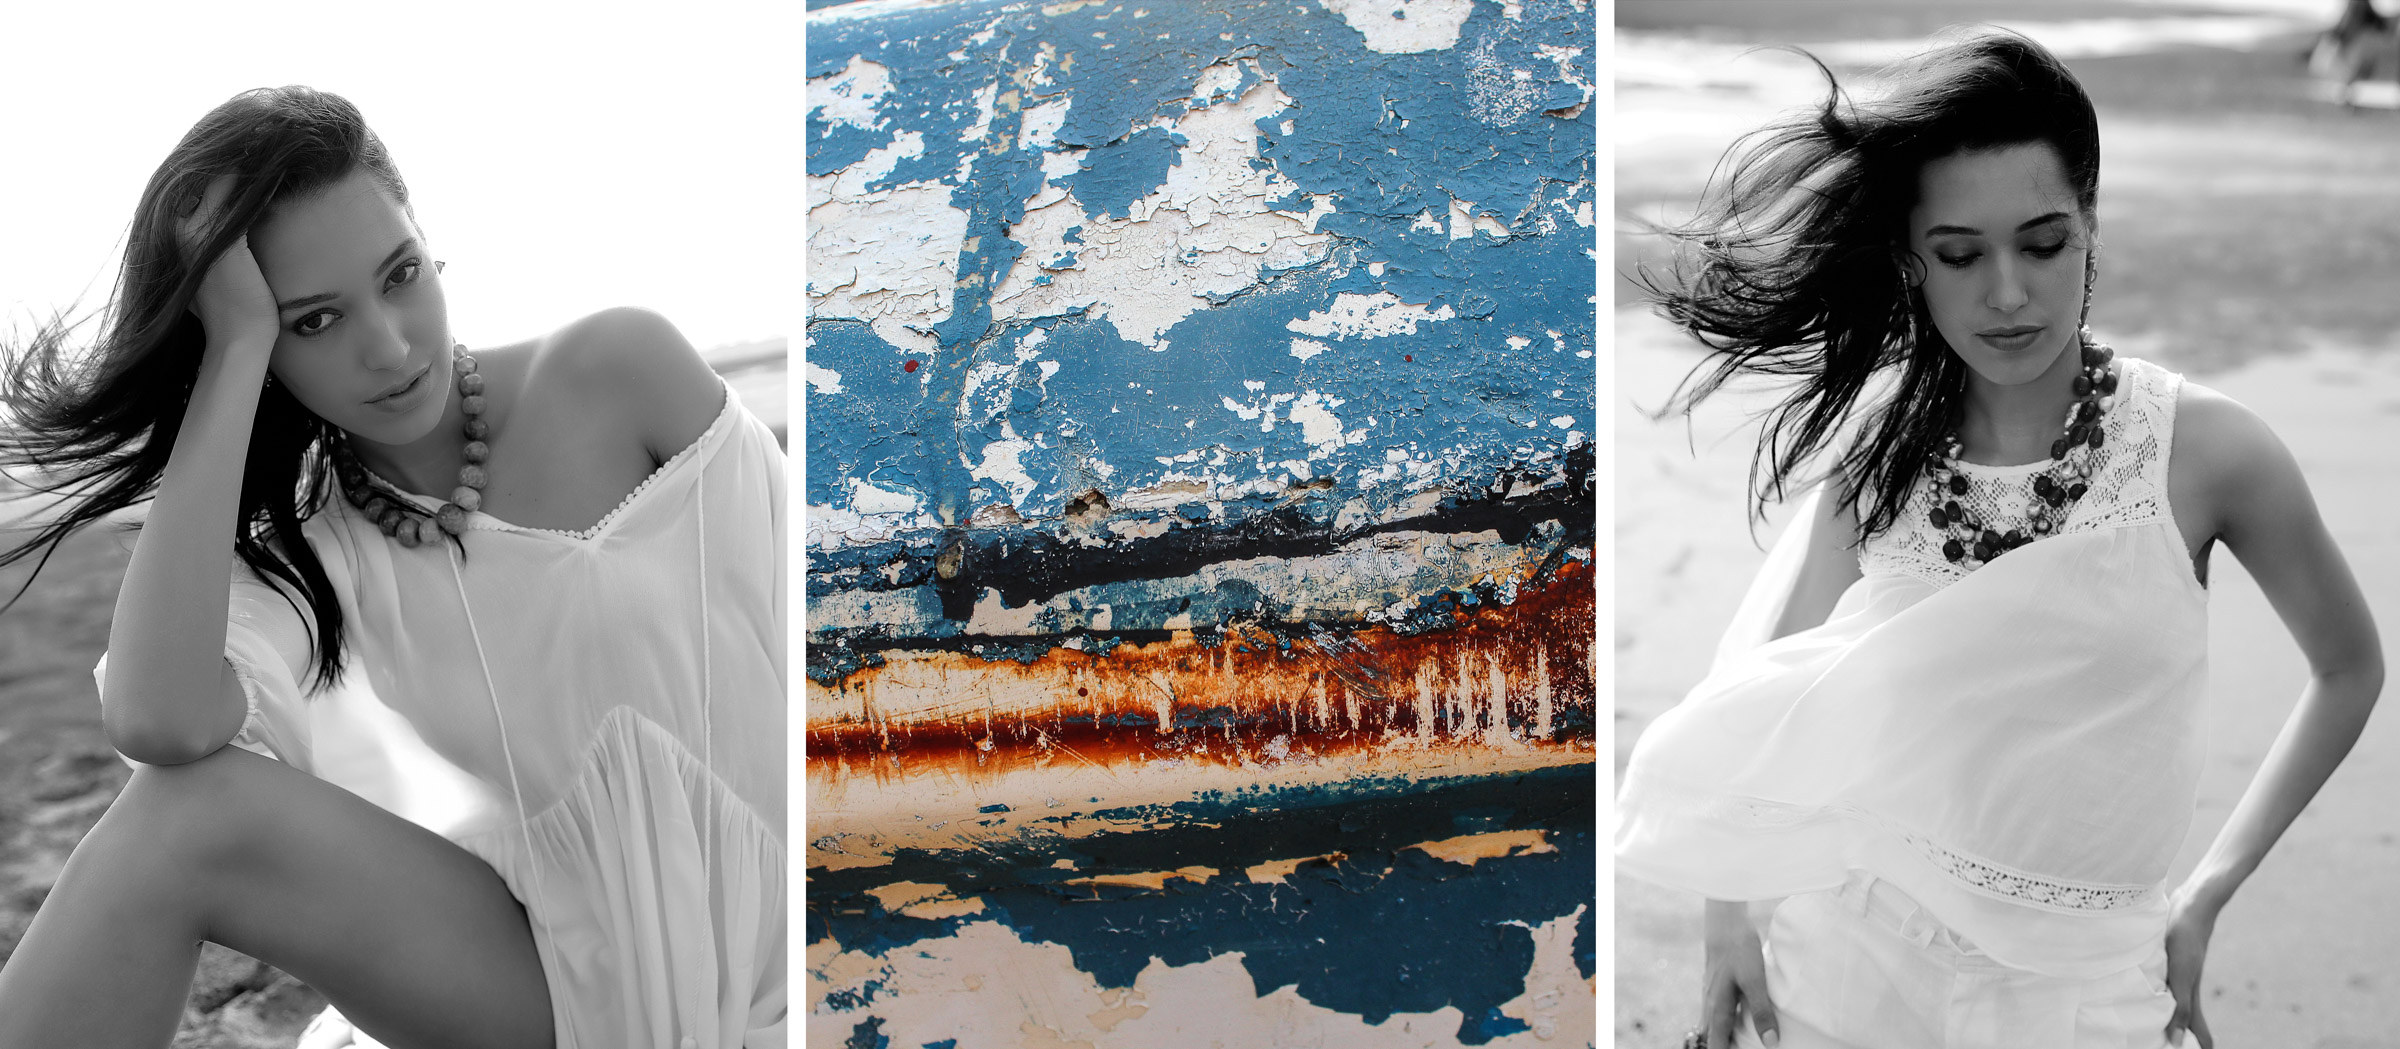 Kriator-Photographer-Vanitas_08.jpg